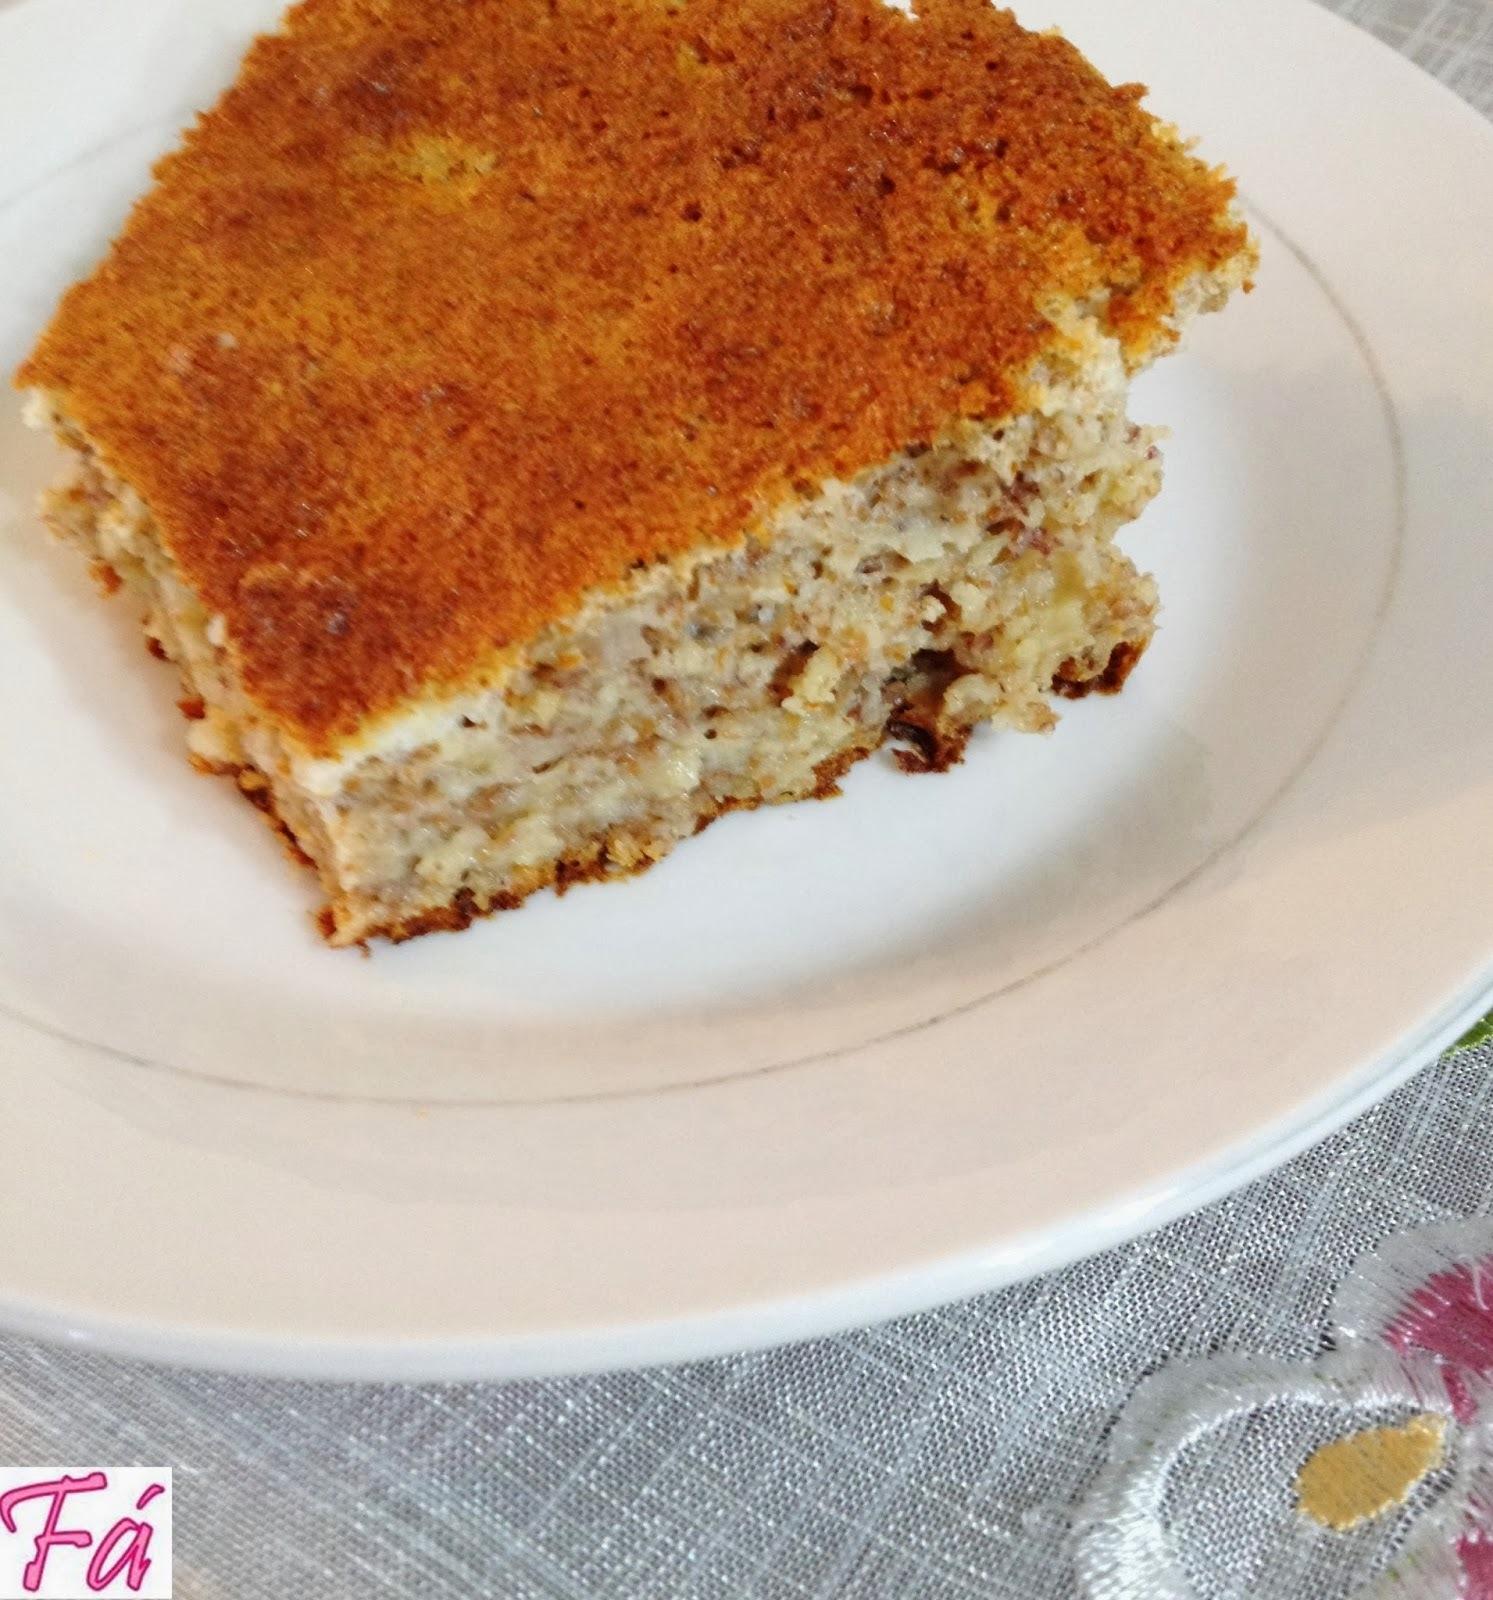 bolo de leite desnatado farelo de aveia farelo de trigo